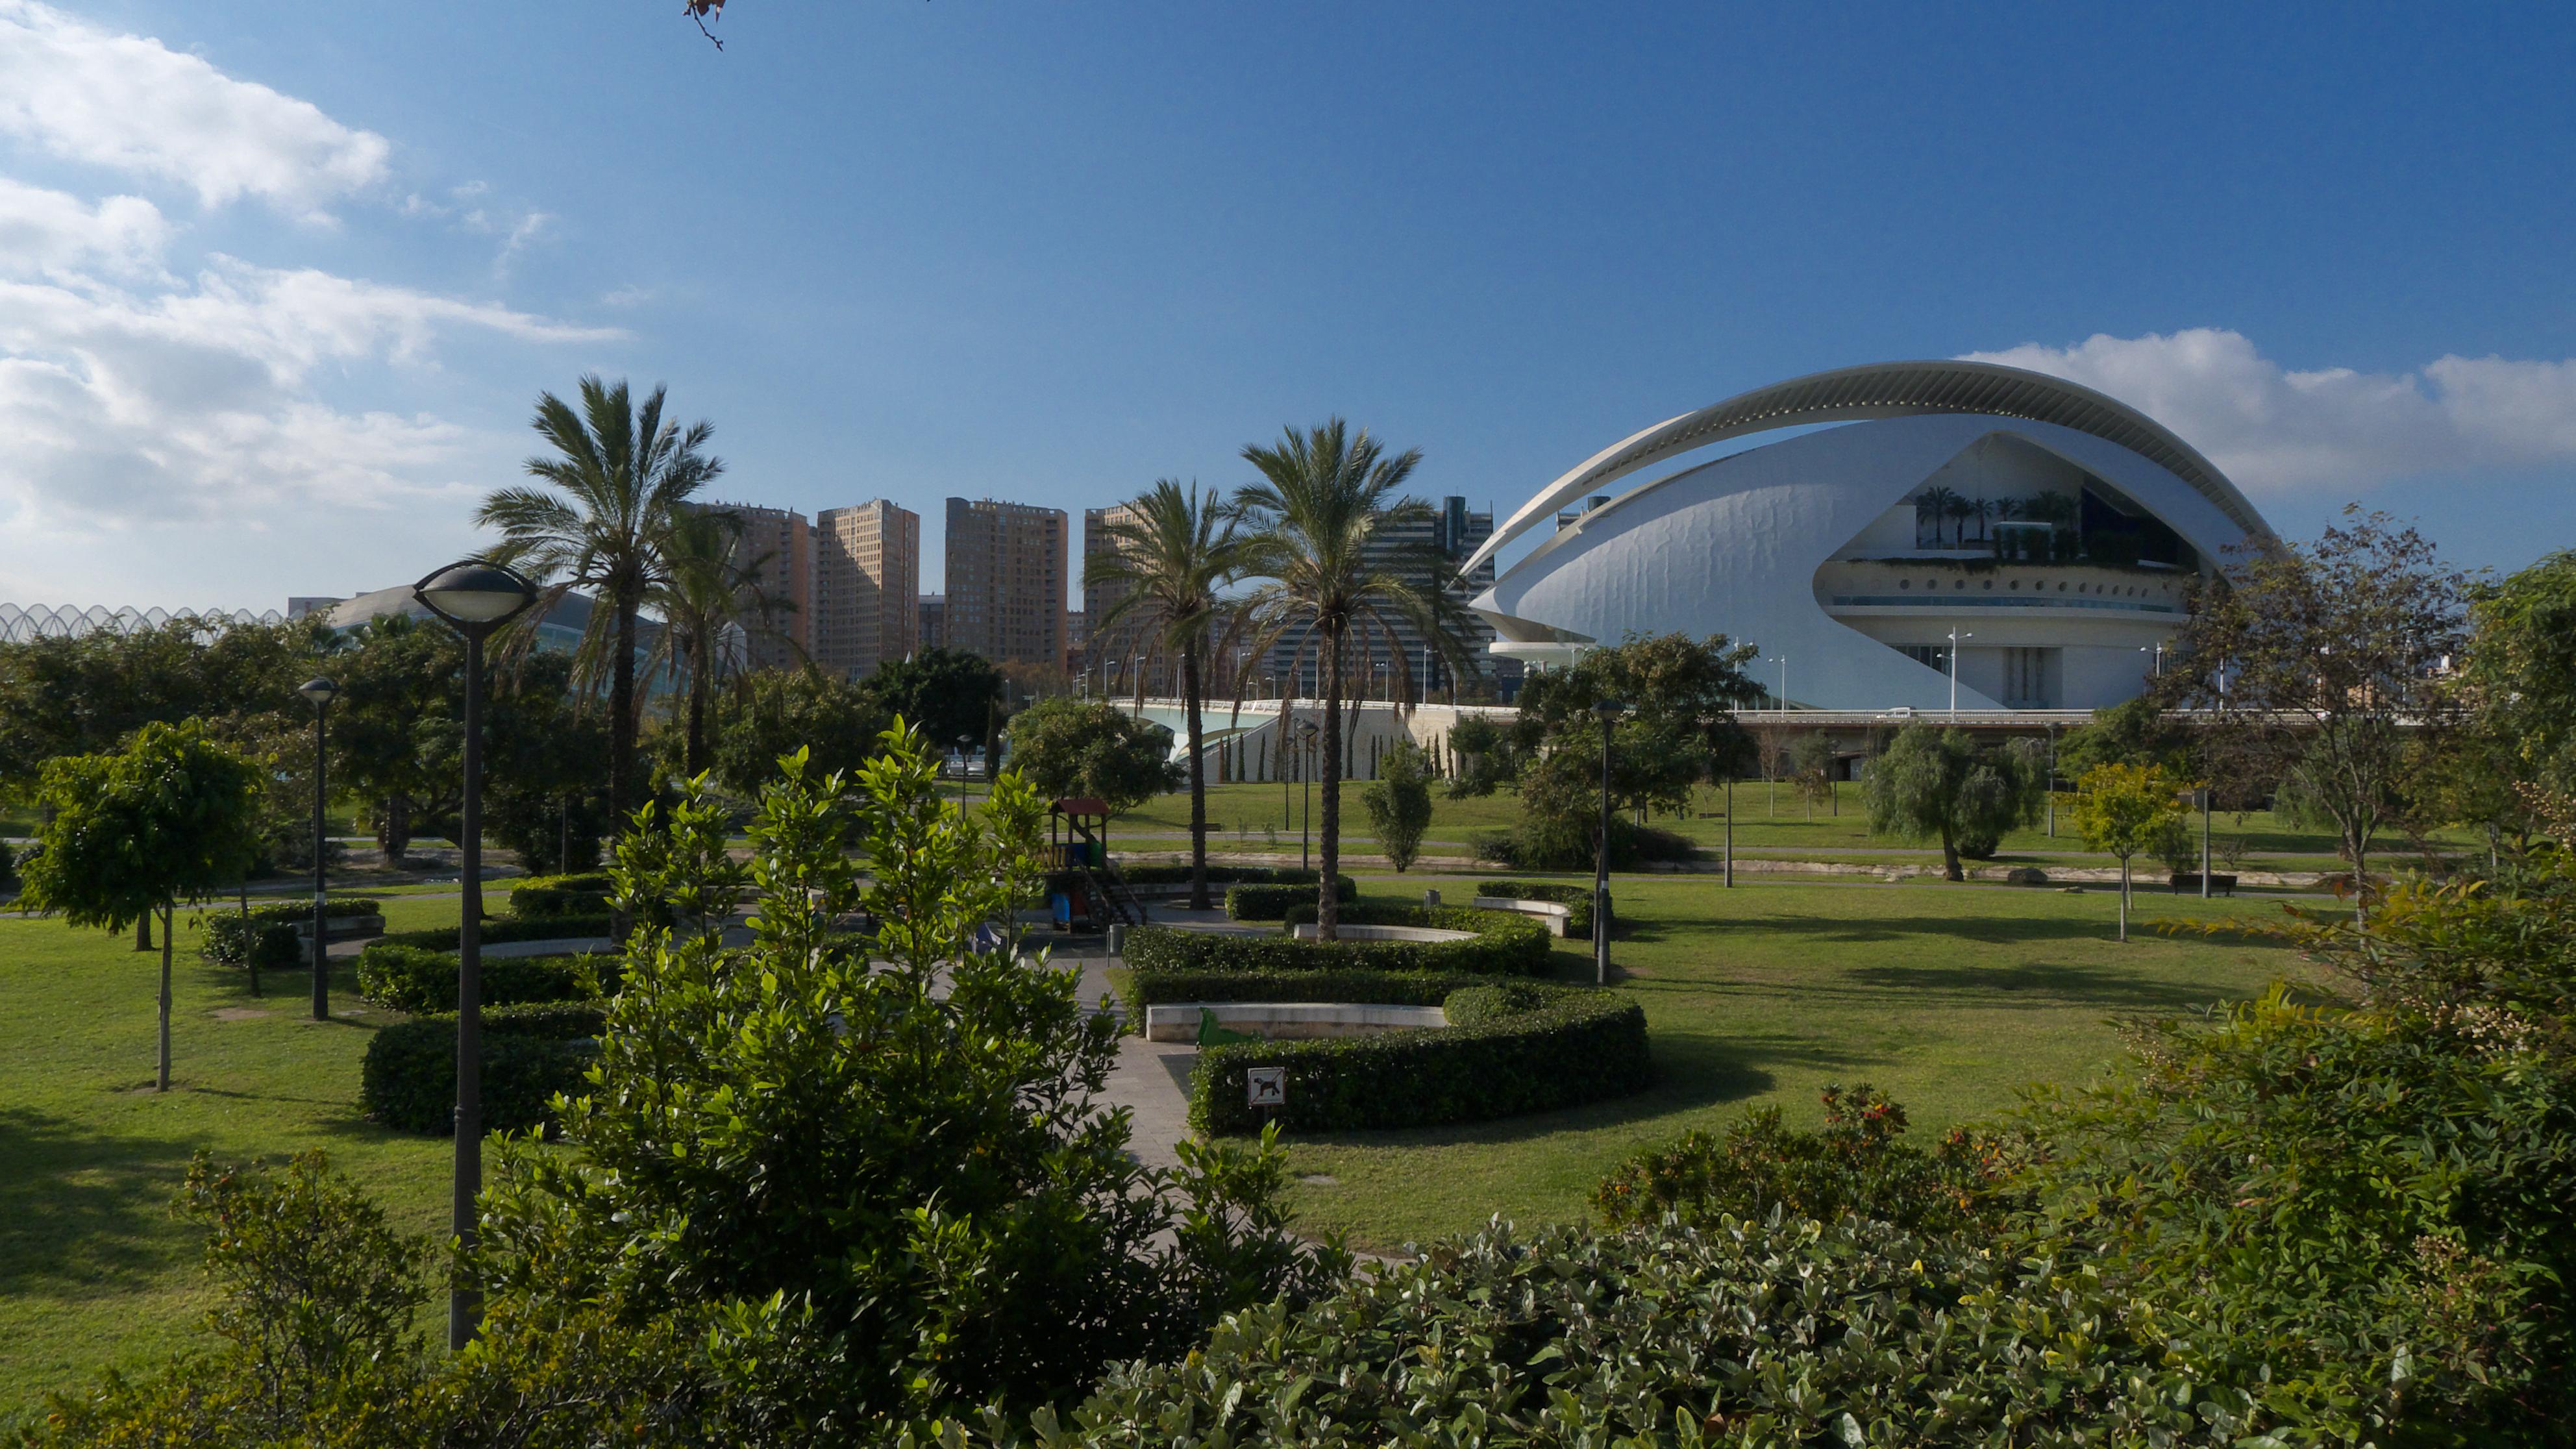 Our favourite spots in Valencia